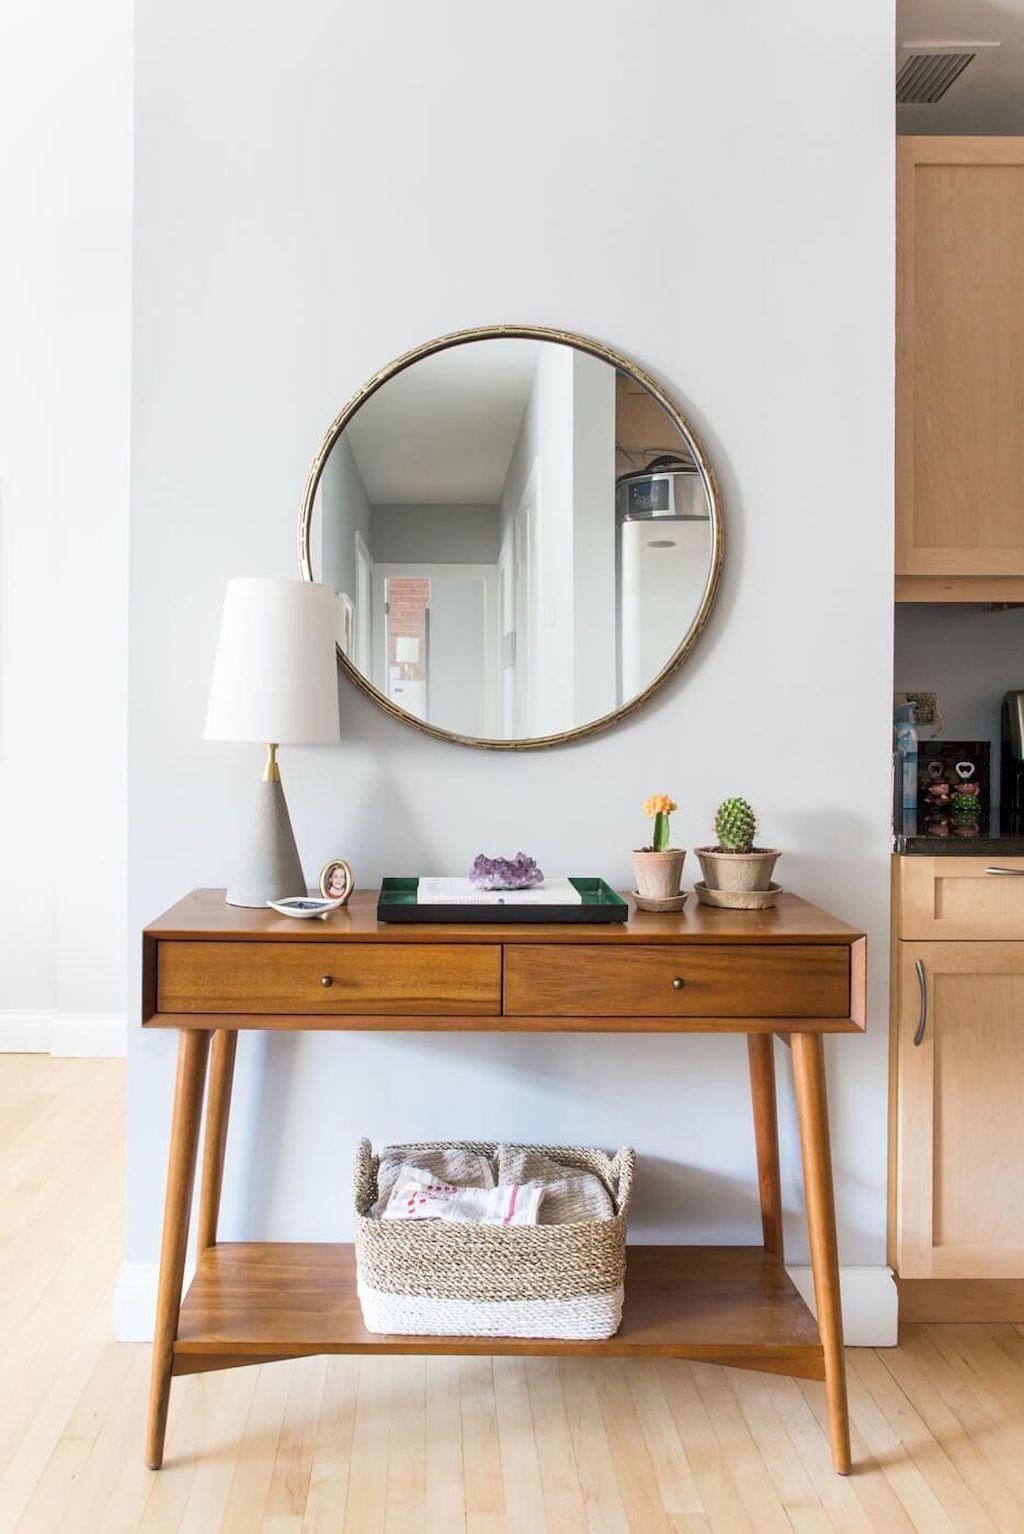 Cool mid century modern home decor u furniture ideas